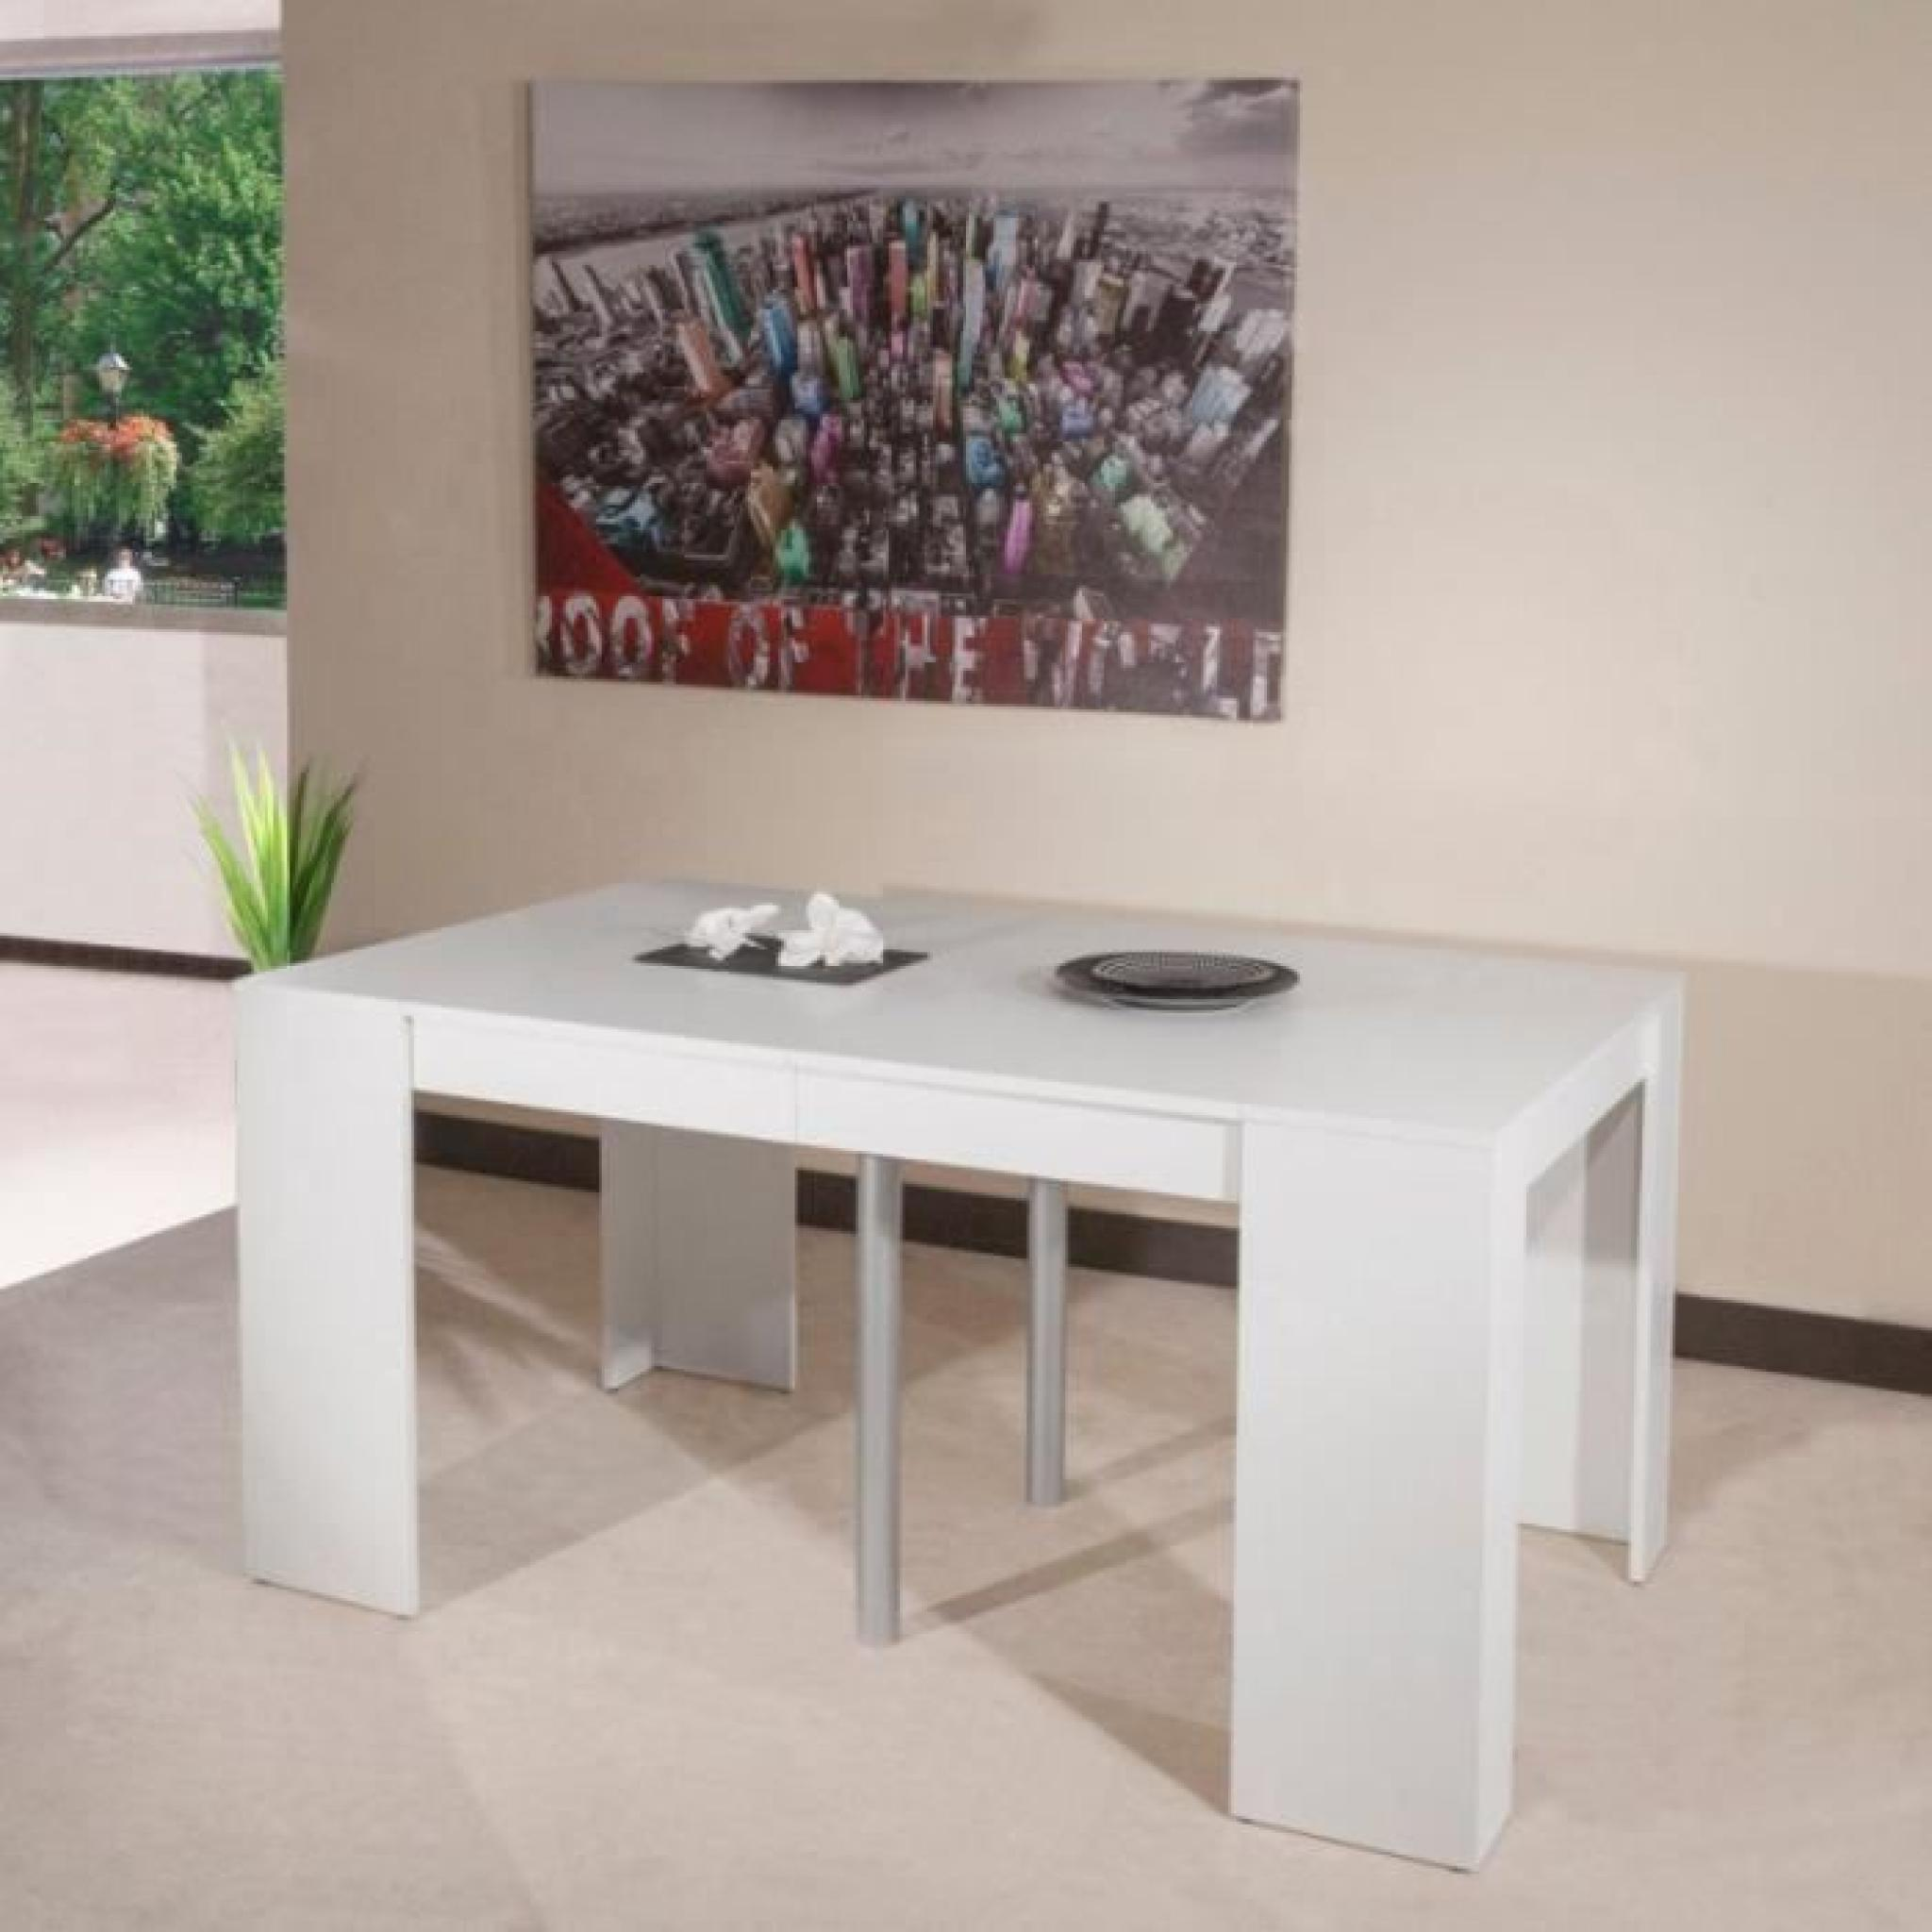 Console elasto blanc mat extensible en table r achat for Console table extensible pas cher